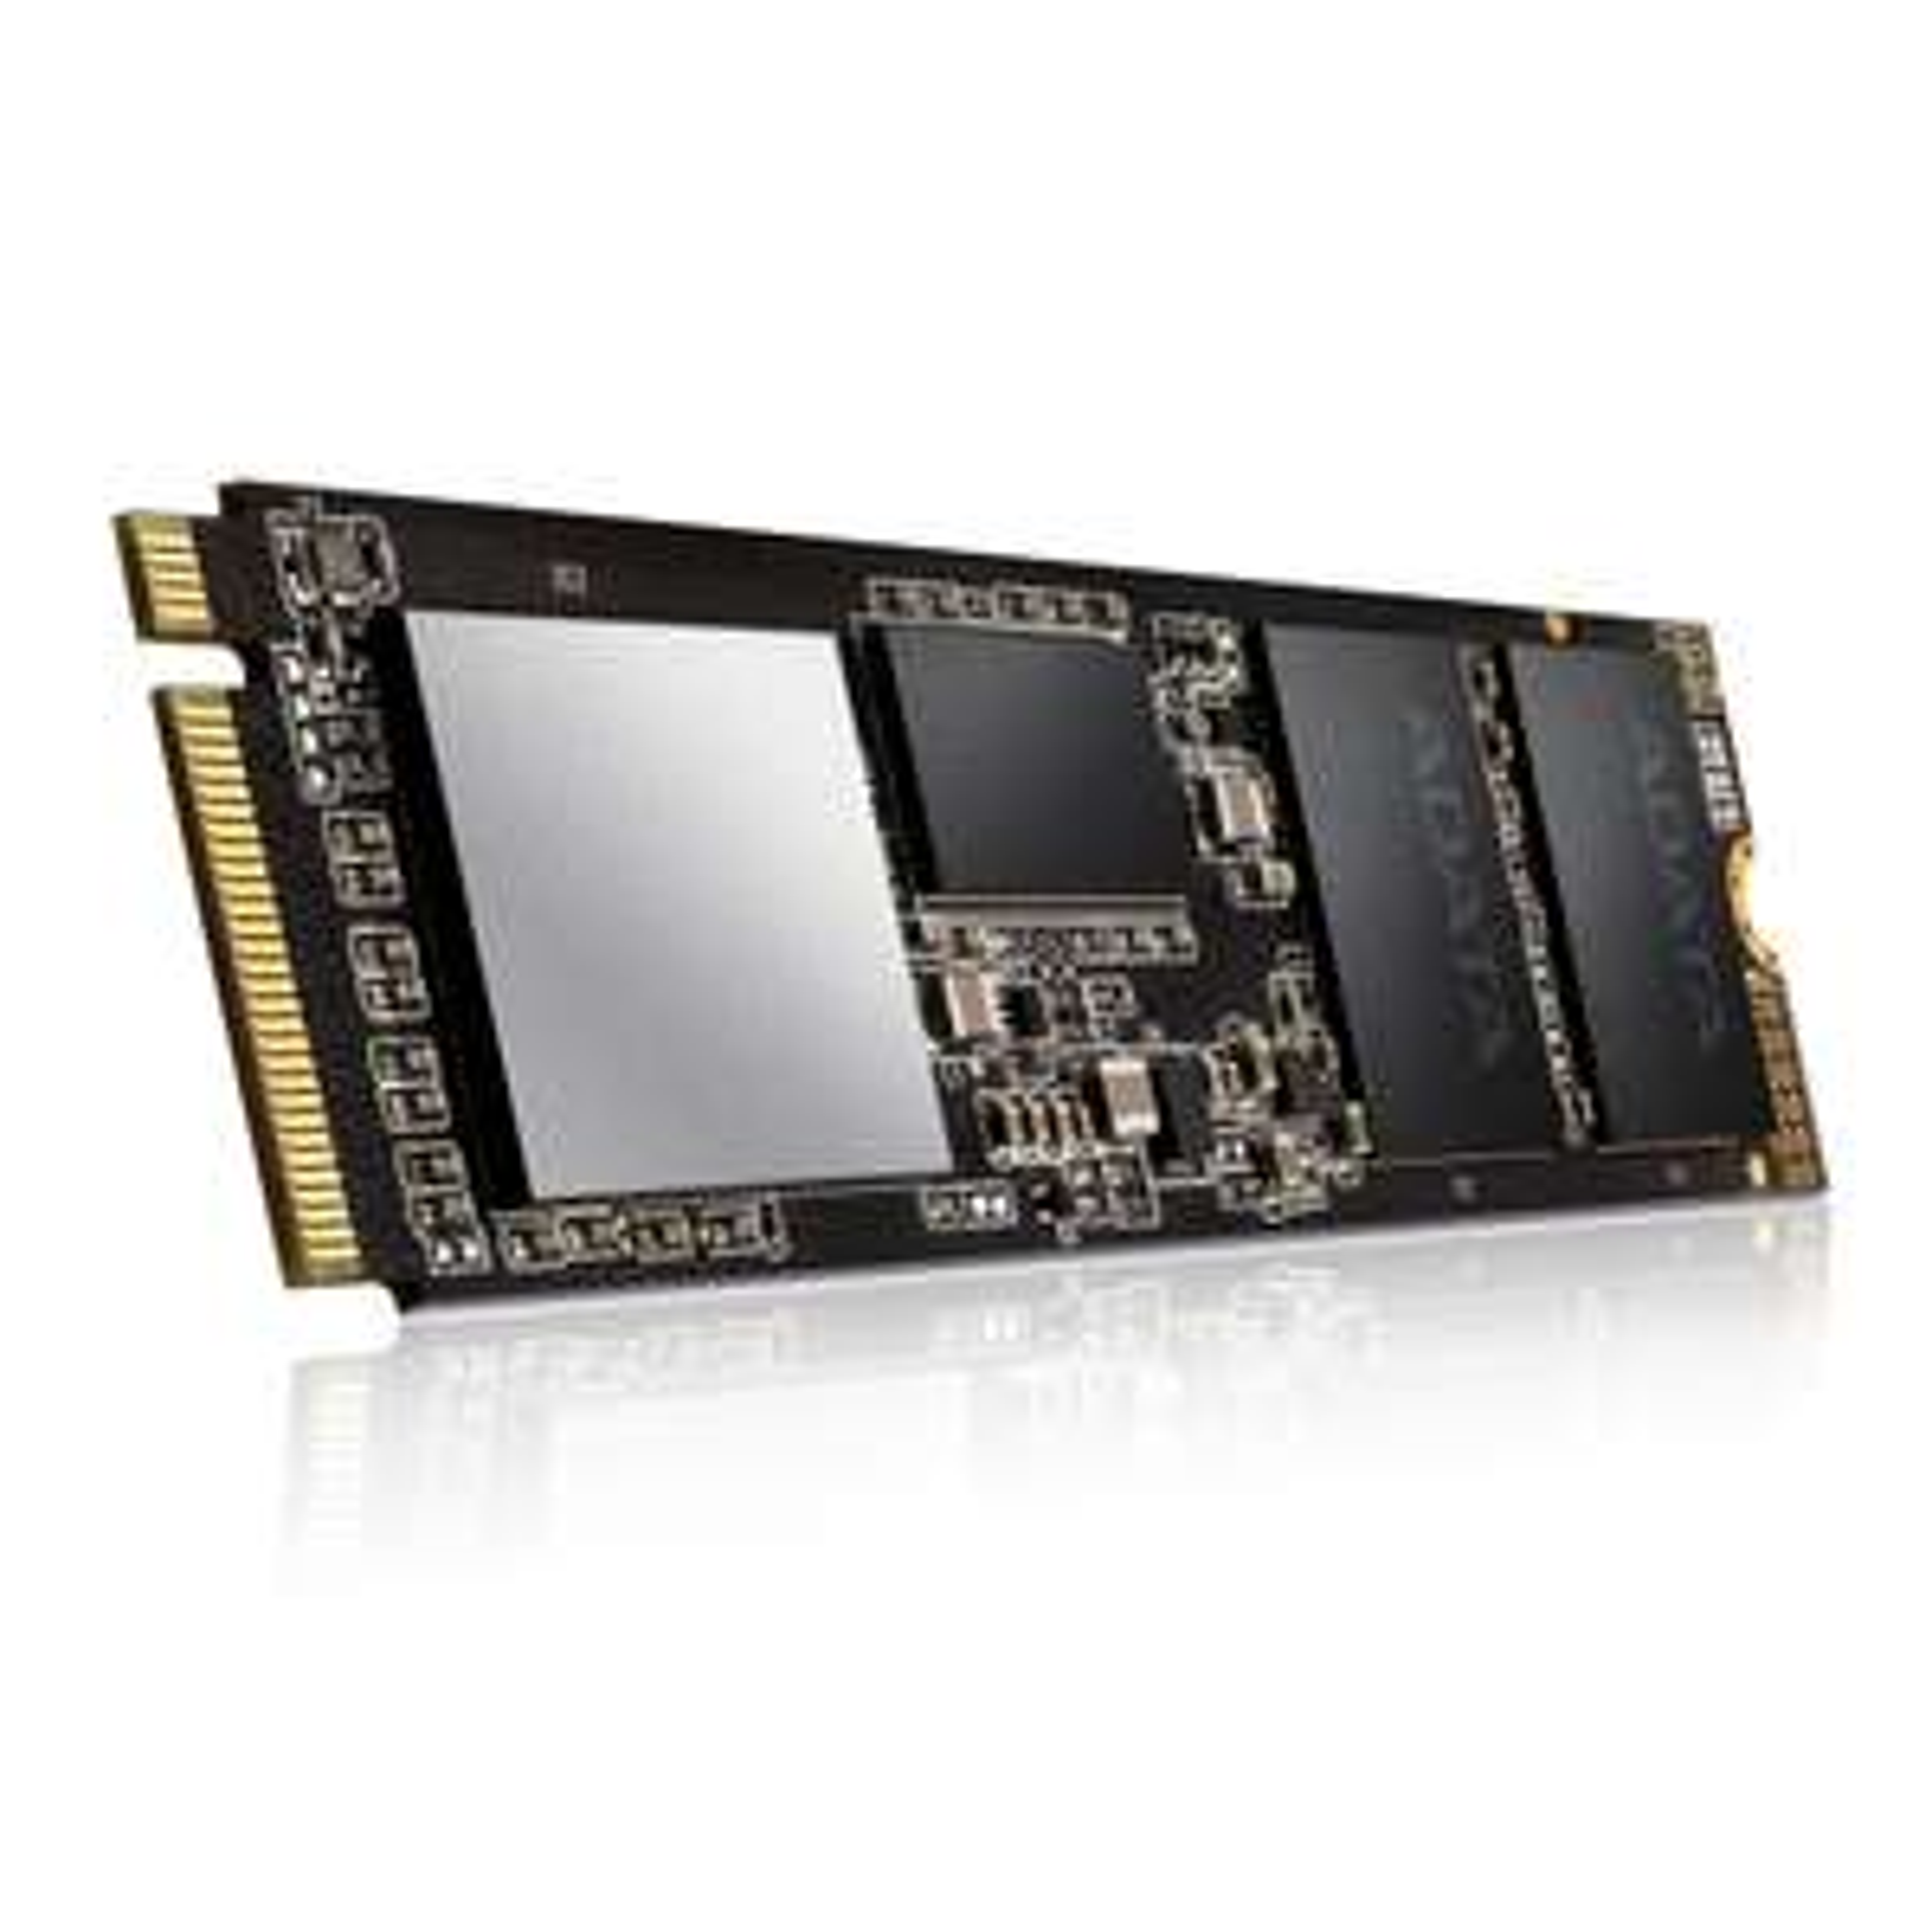 Adata XPG SX8200 480GB M.2 2280 PCIe NVMe SSD - £99.89 @ Lamda-tek